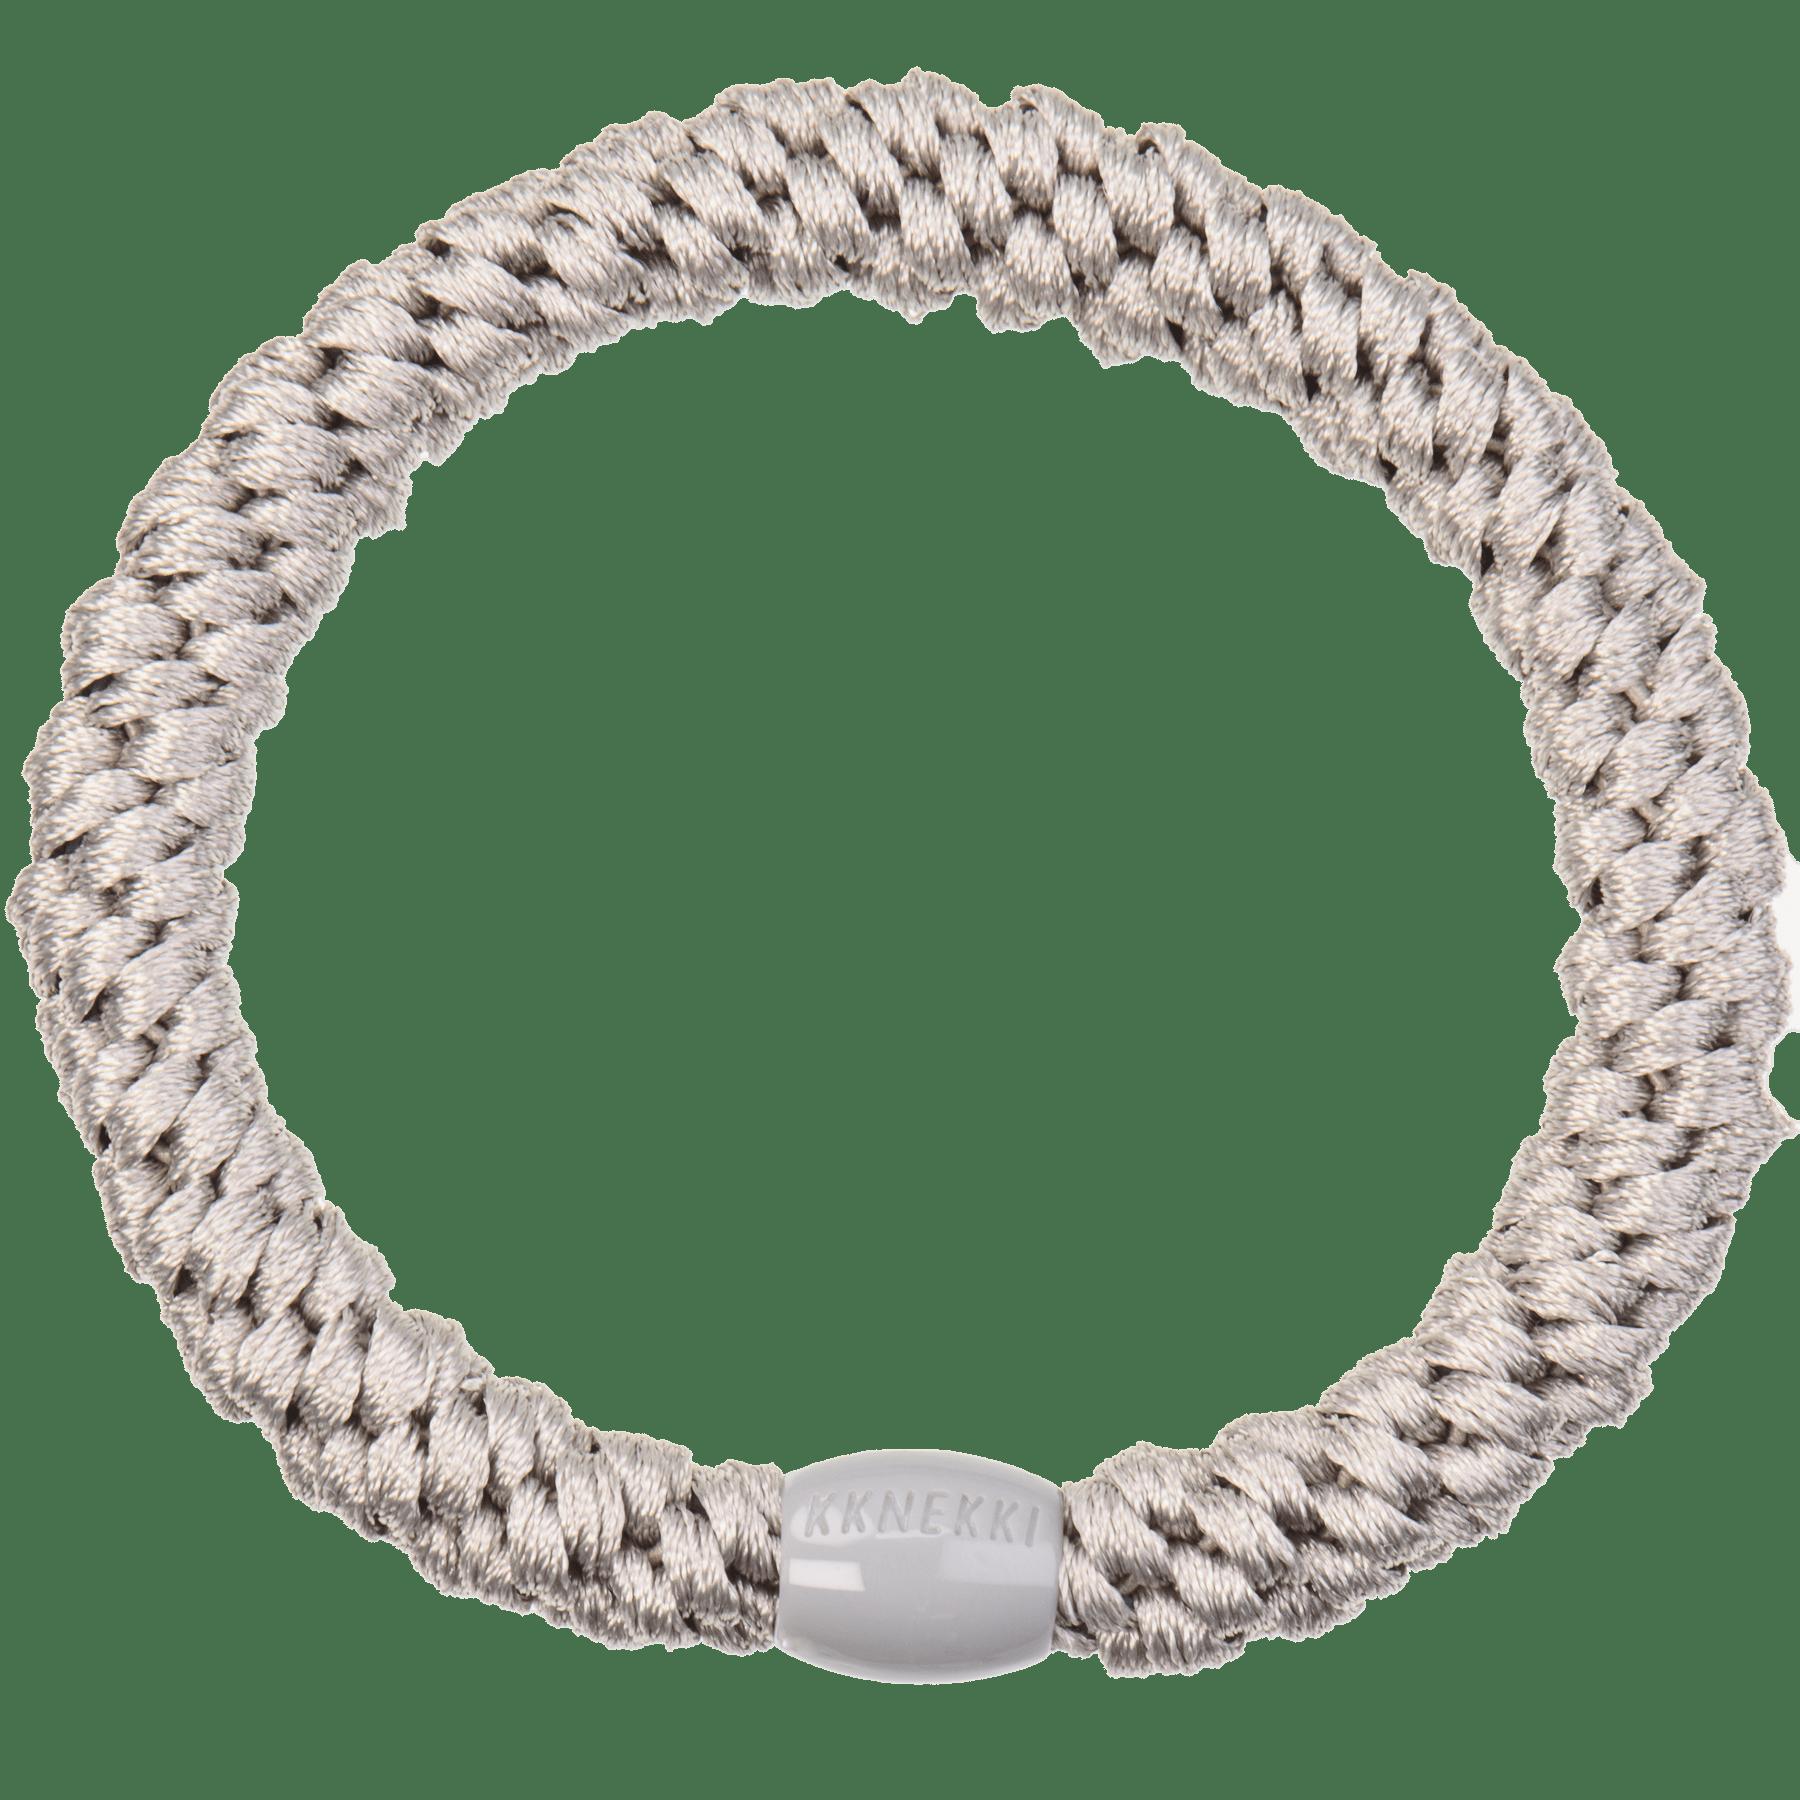 Haargummi / Armband - Linen 5158 - KKNEKKI